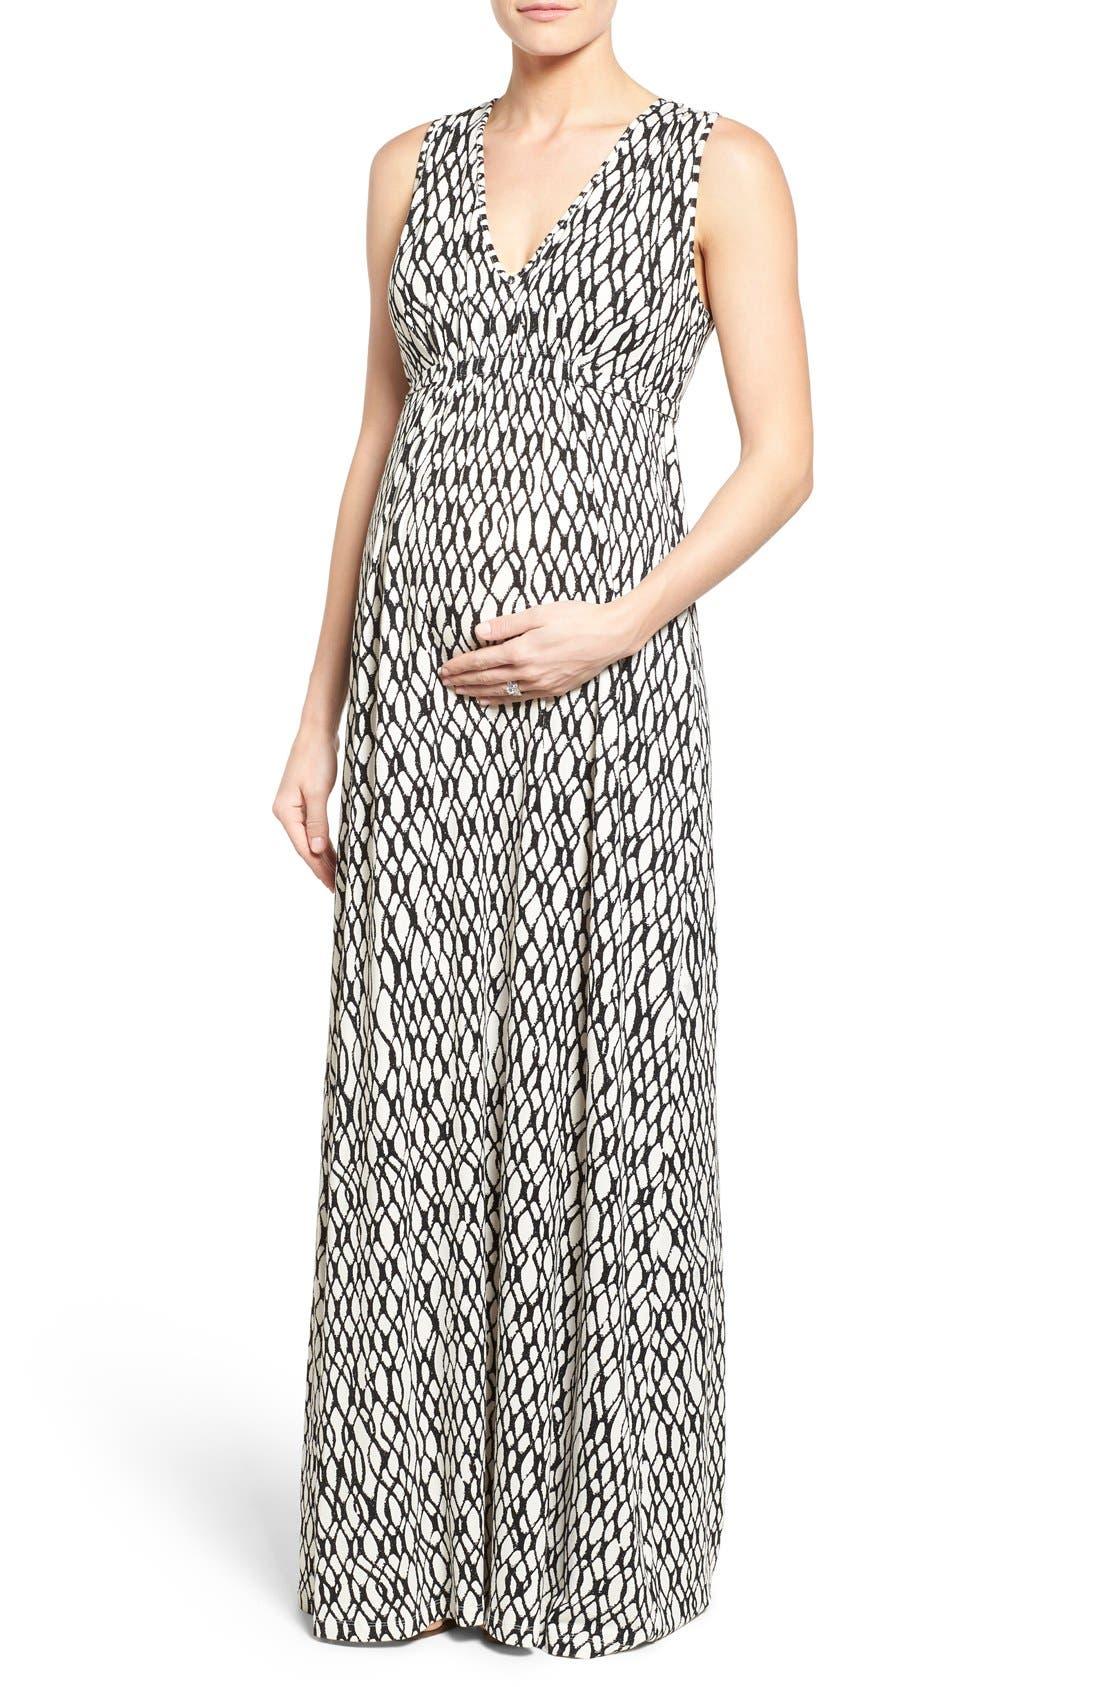 'Grecia' Print Jersey Maternity Maxi Dress,                         Main,                         color, 101